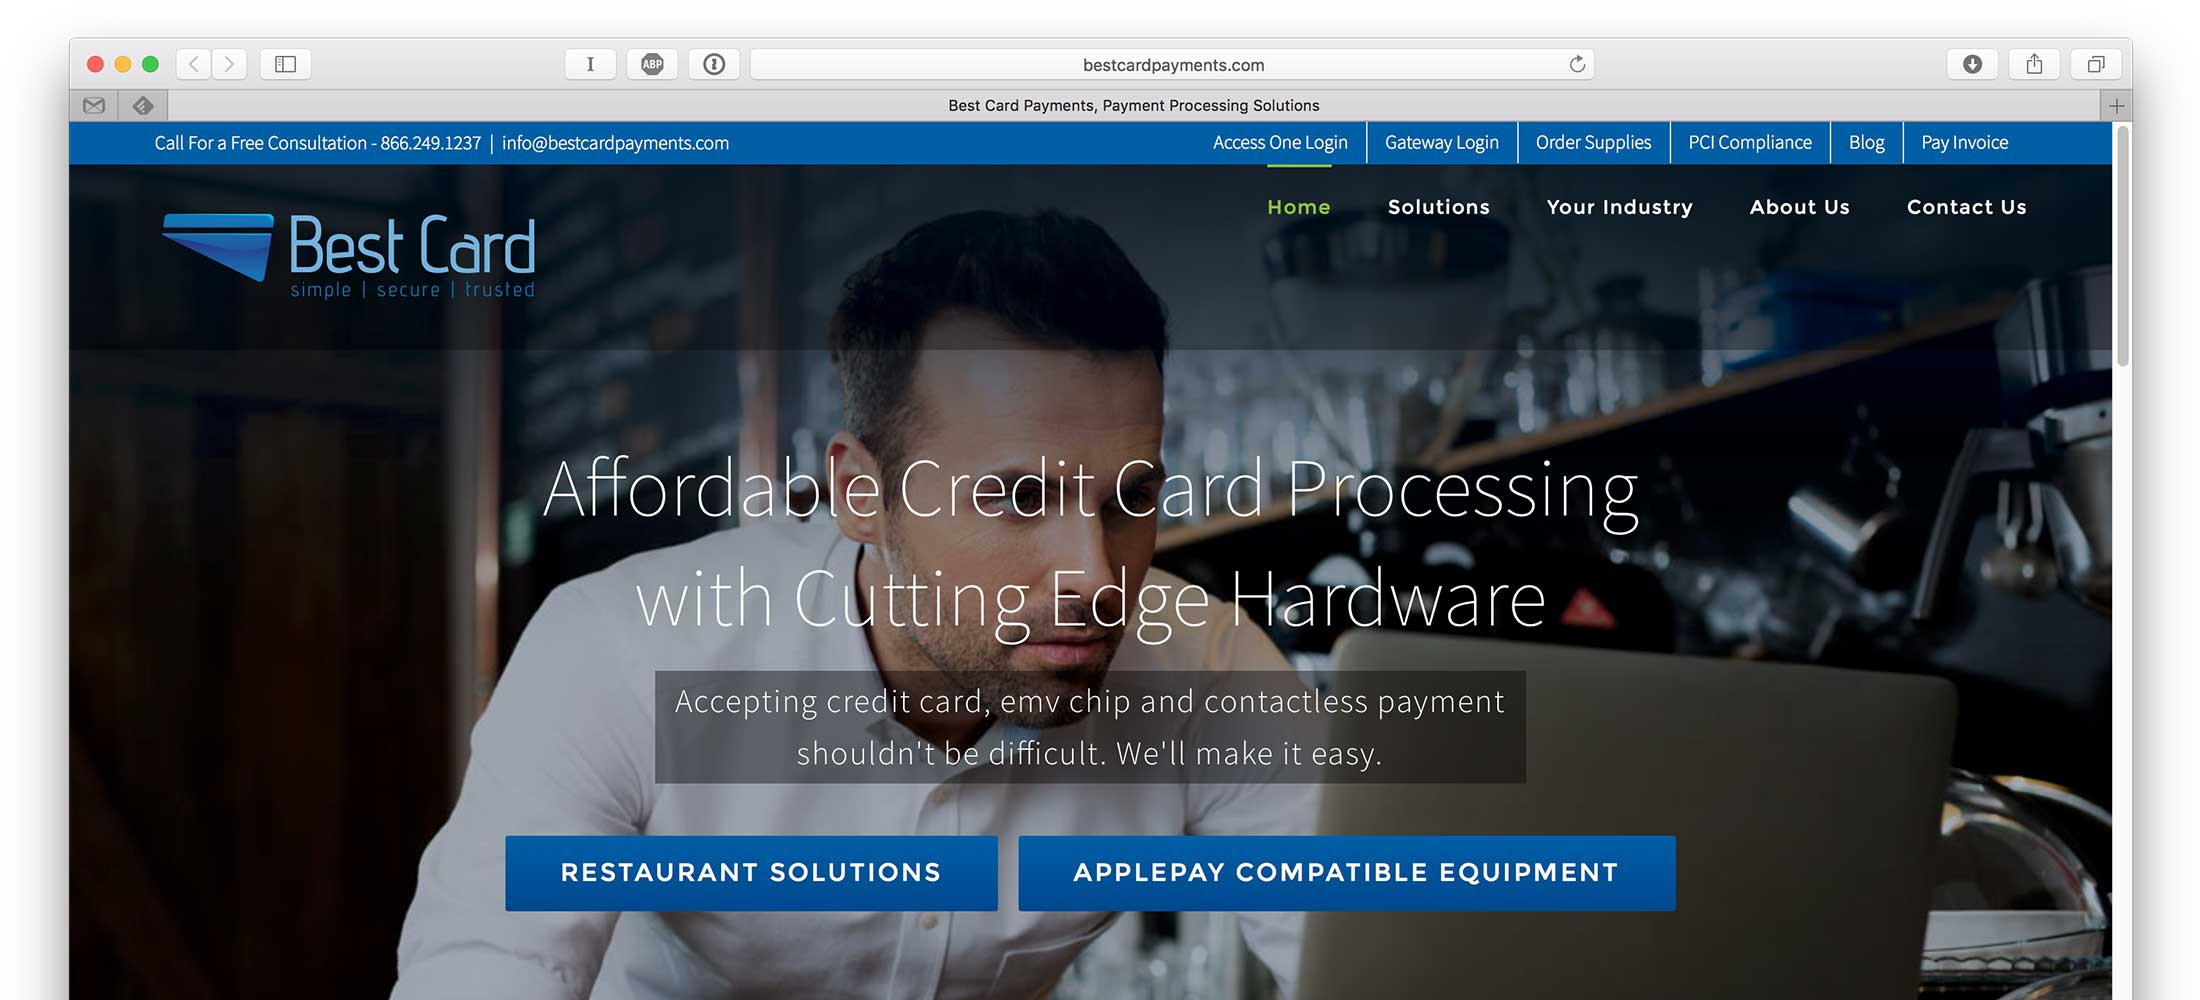 Best Card Website Design 2